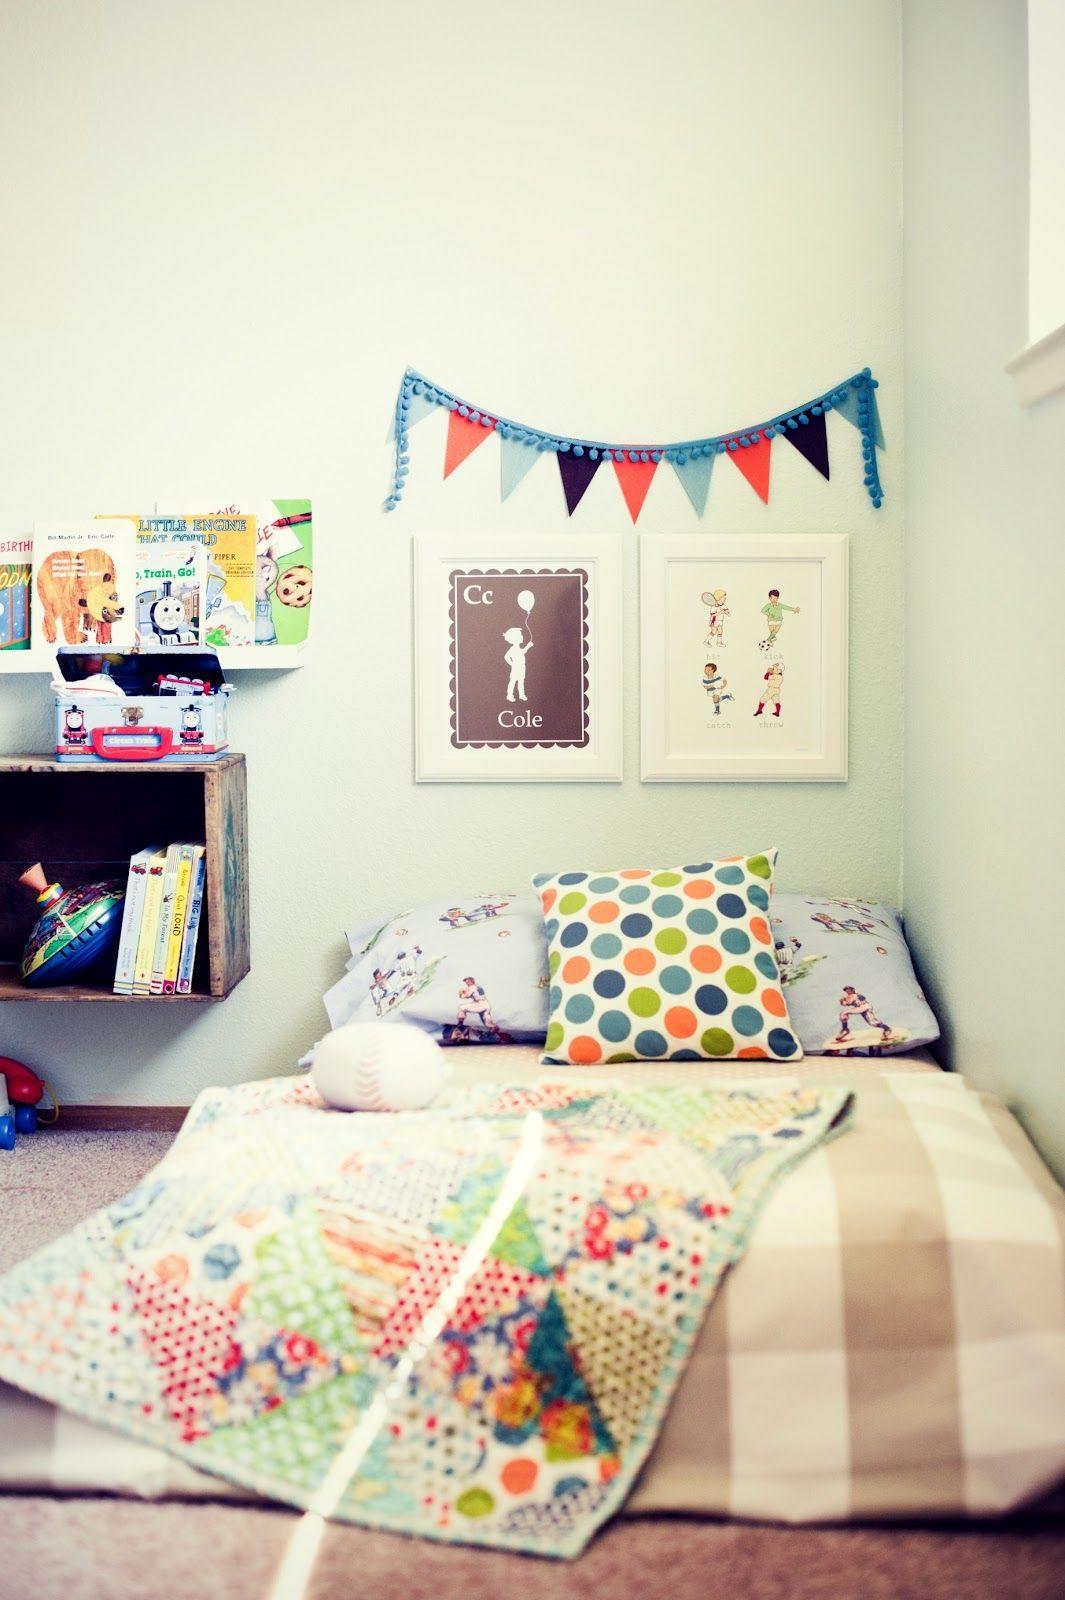 Lit Enfant Barreau Luxe Mattress On the Floor = toddler Bed Montessori Nursery